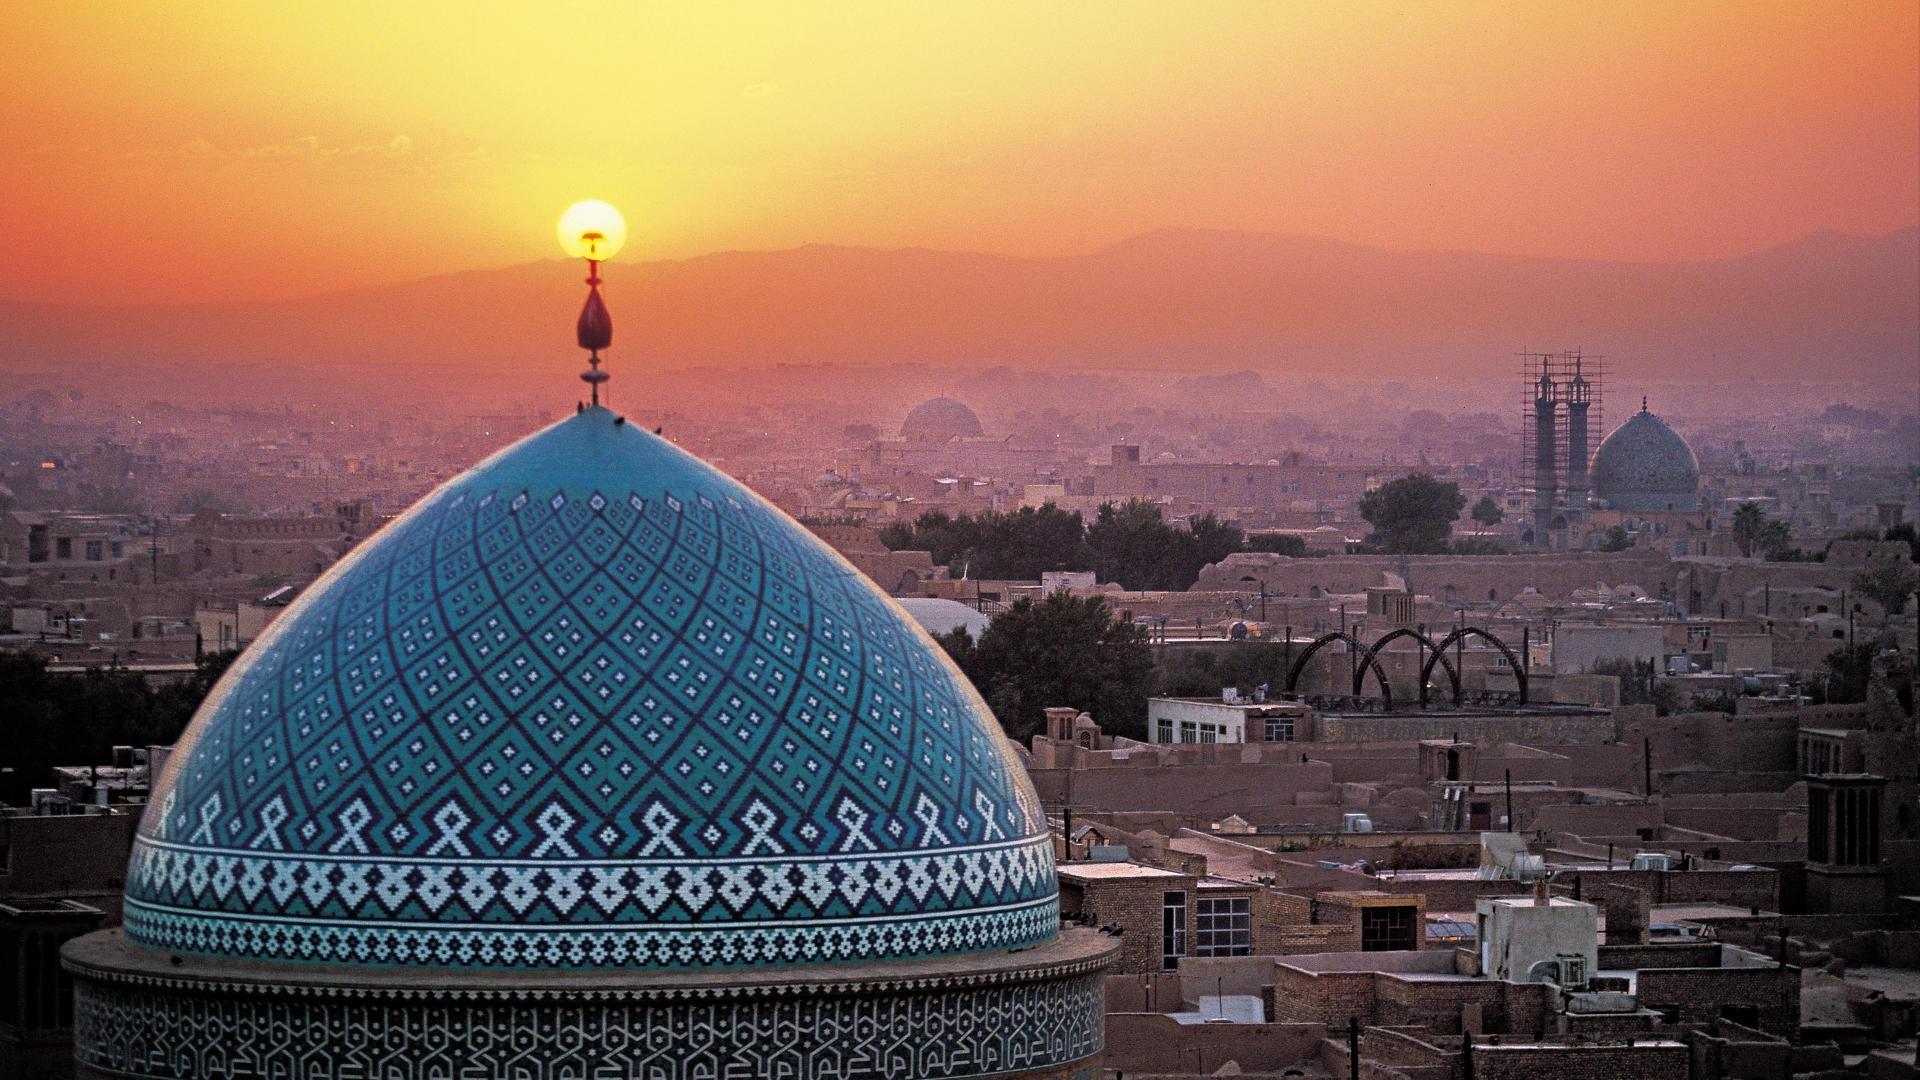 150187-Islam-Iran-sunset-Islamic_architecture-Mosque